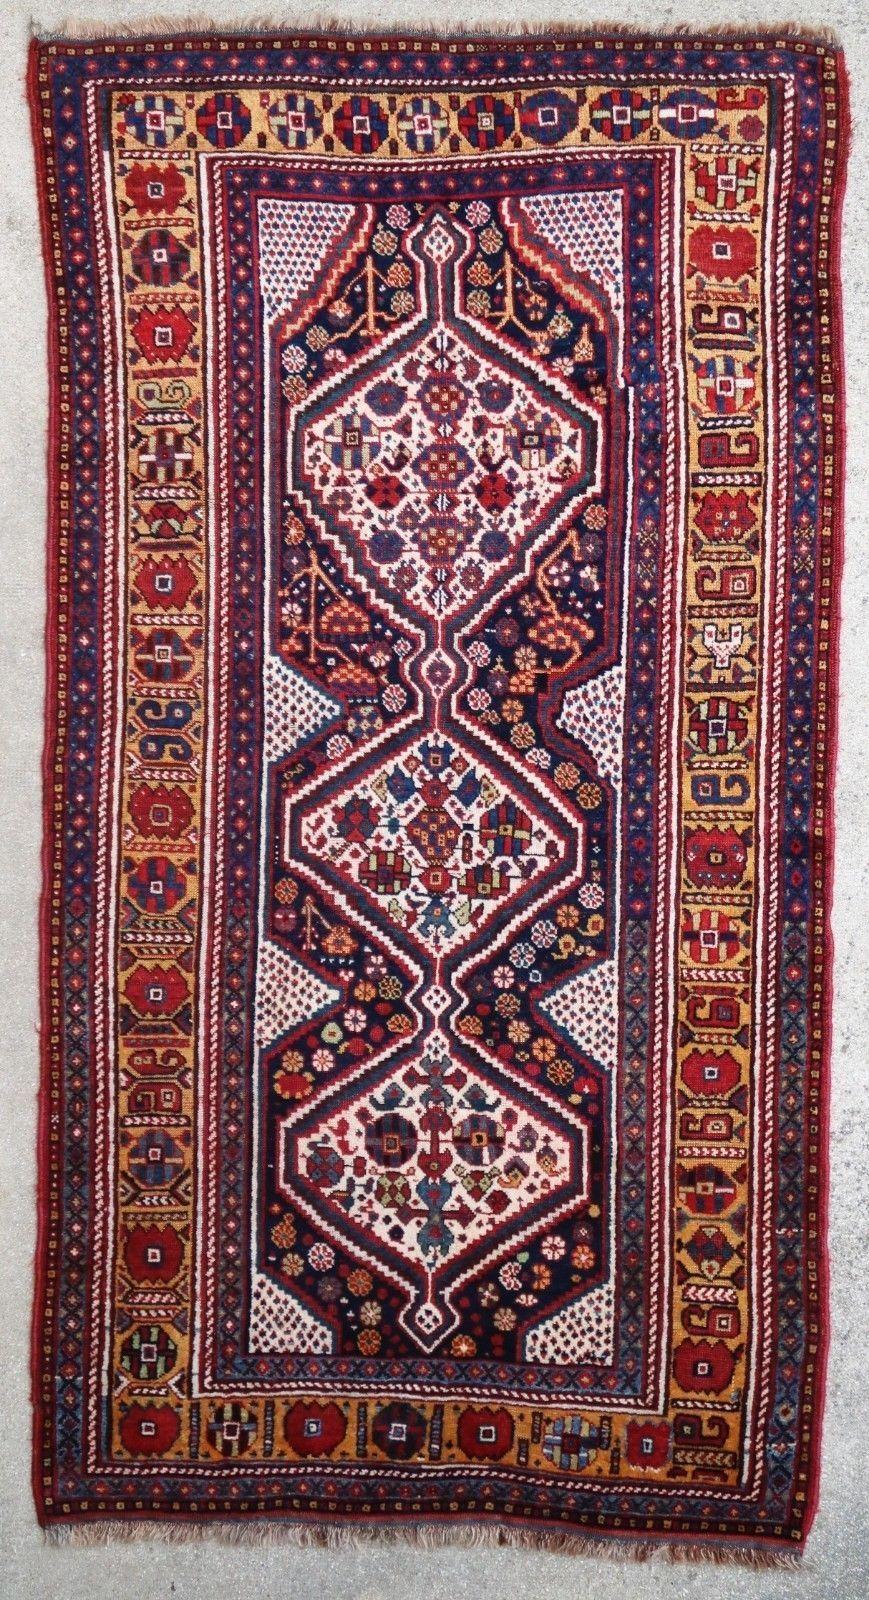 Antique Persian rug Ghashghai 1900 by Christian Doux